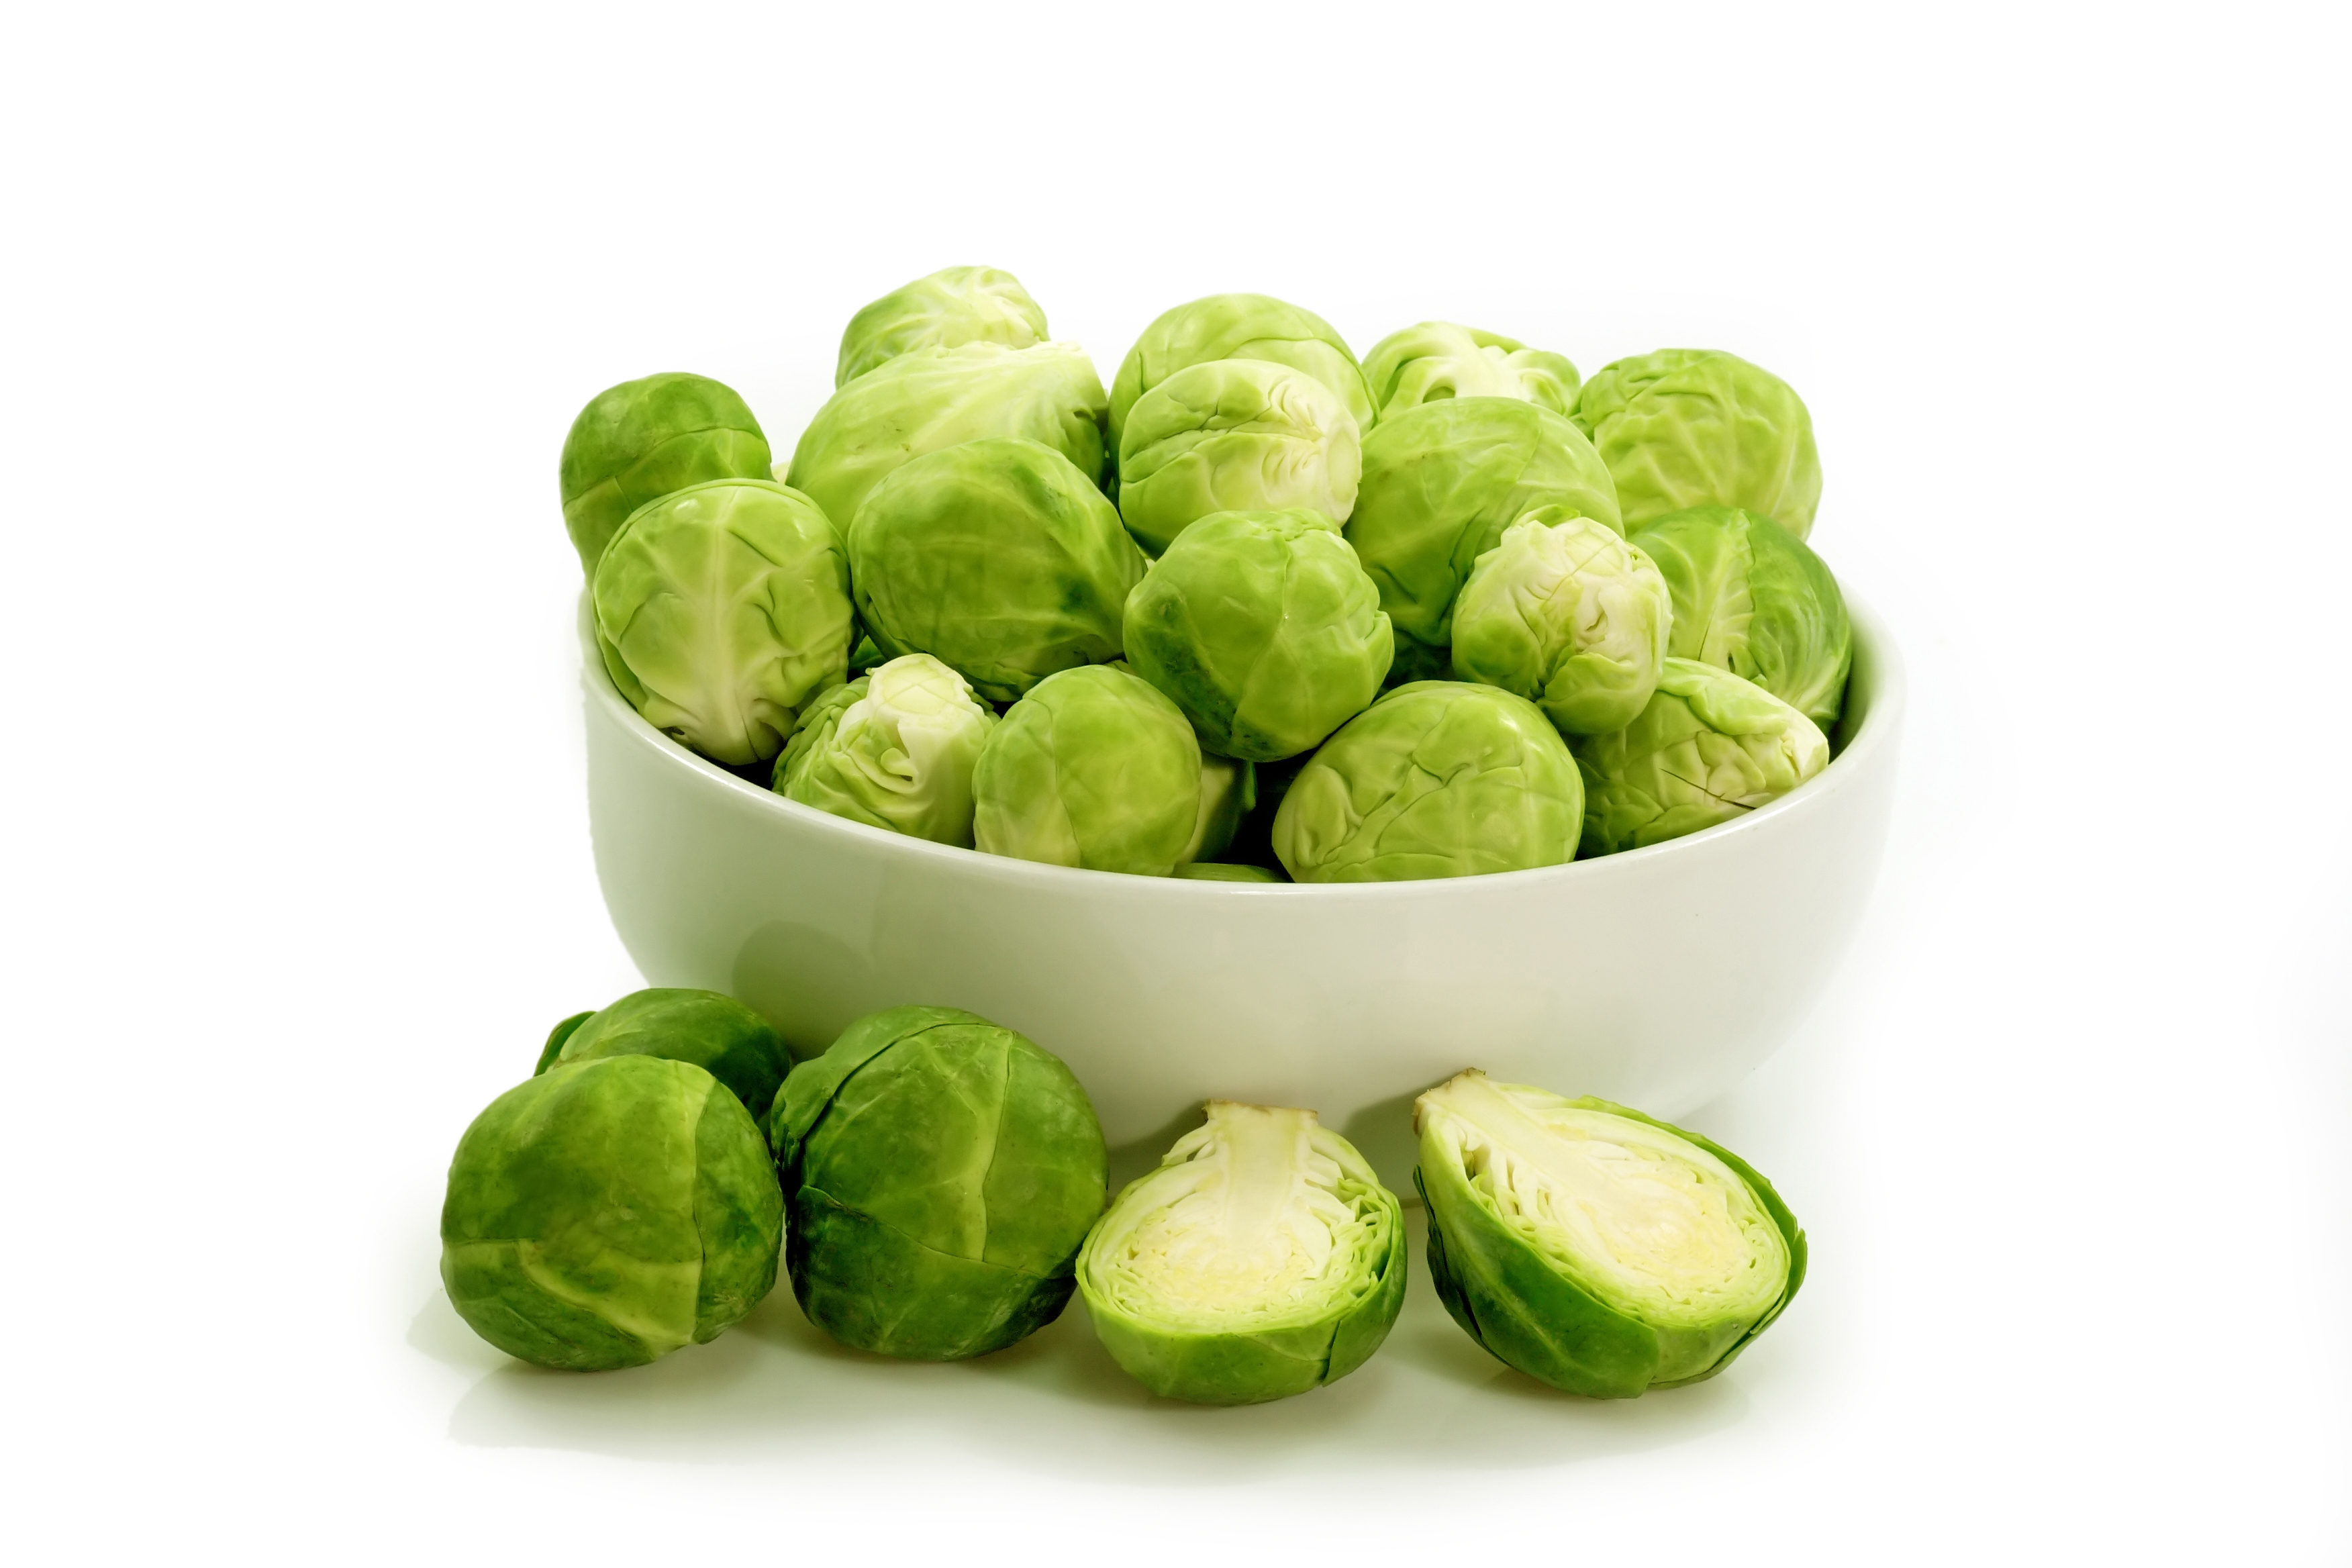 30.کلم بروکسل- منبع پروتئین گیاهی